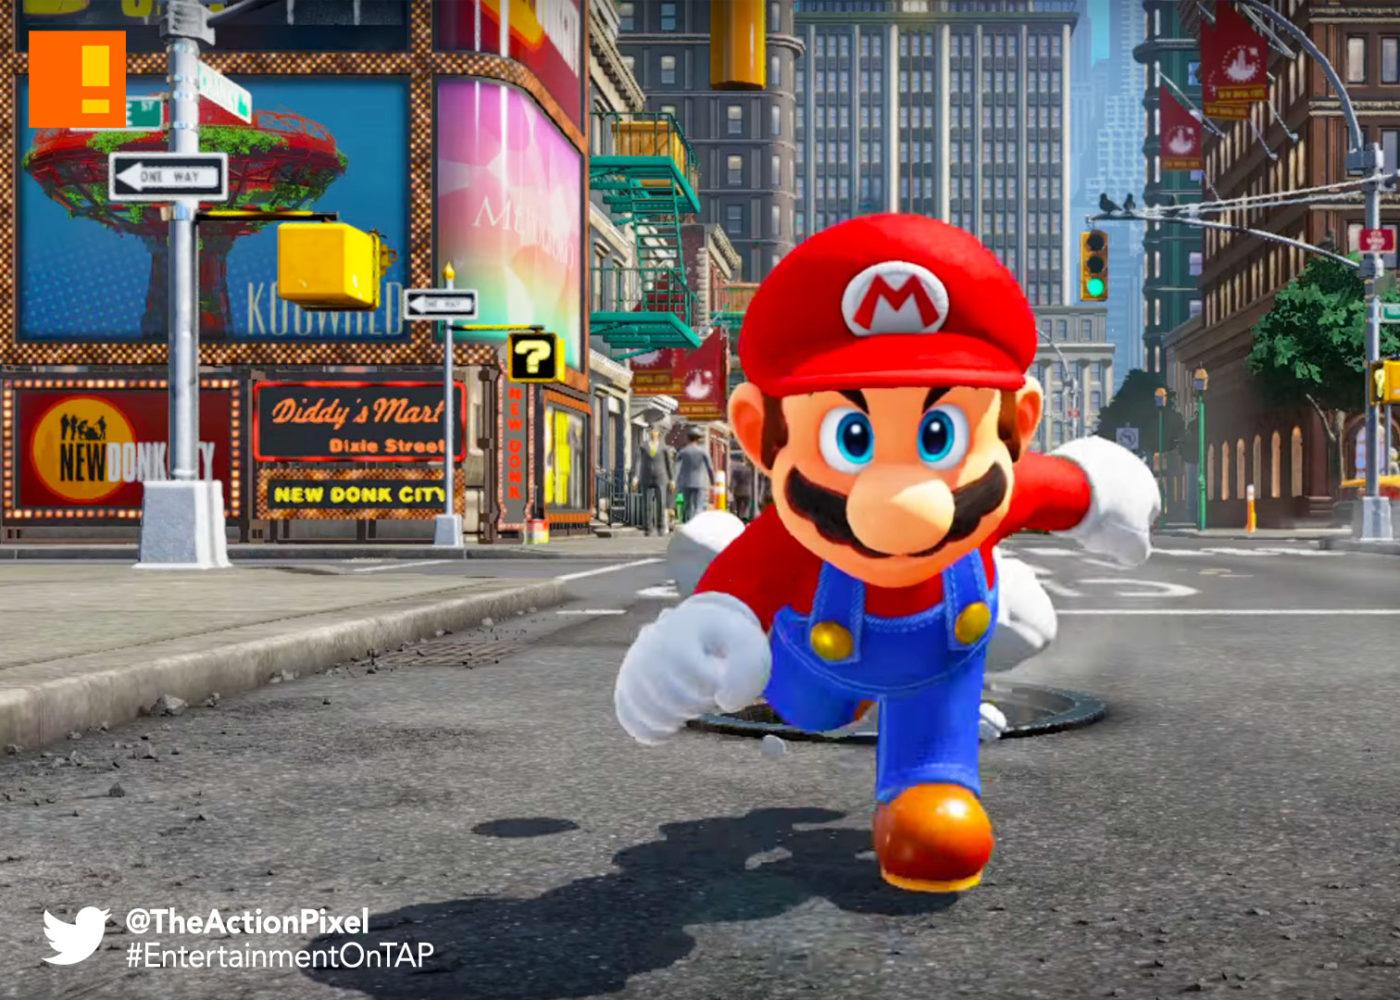 super mario ,odyssey,nintendo,switch, super mario odyssey, nintendo switch, the action pixel, mario, entertainment on tap, magic, mushroom kingdom,trailer,